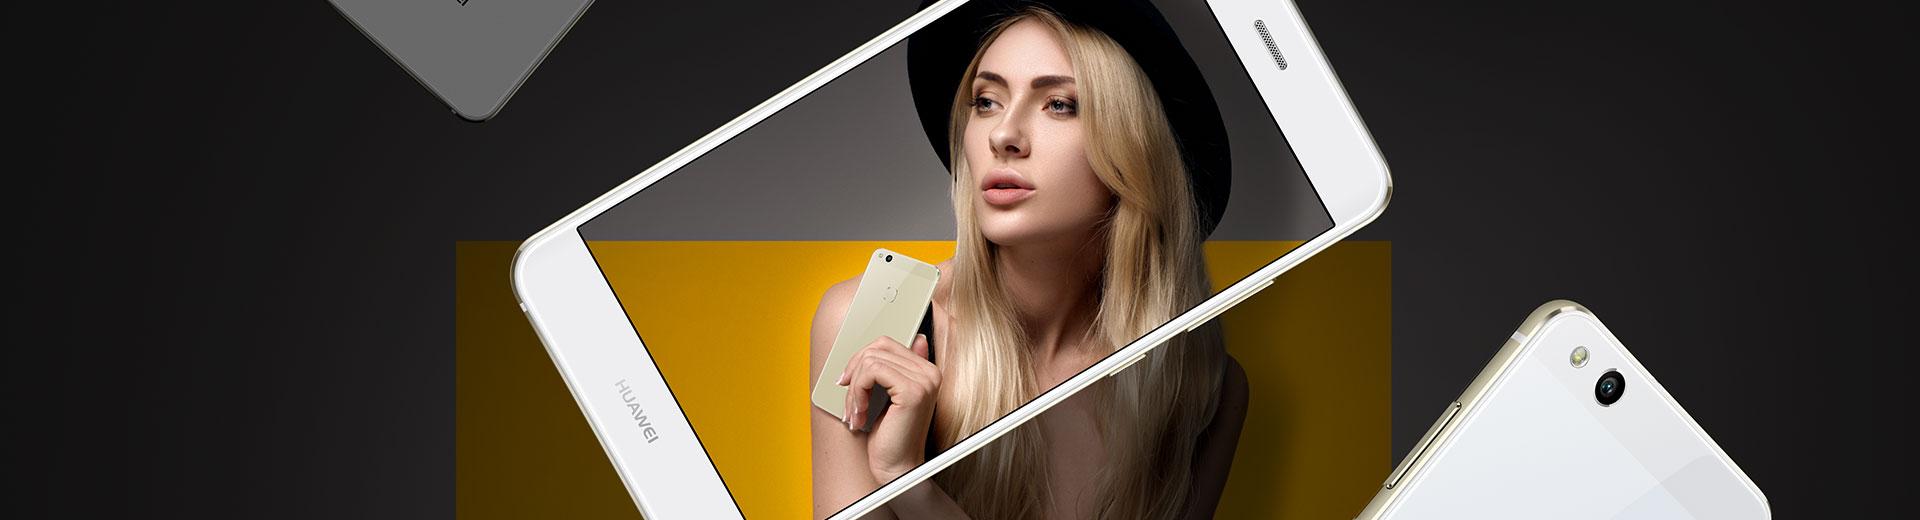 http://consumer-res.huaweistatic.com/de/mobile-phones/p10lite/assets/img/section5Bg.jpg?1491816855716